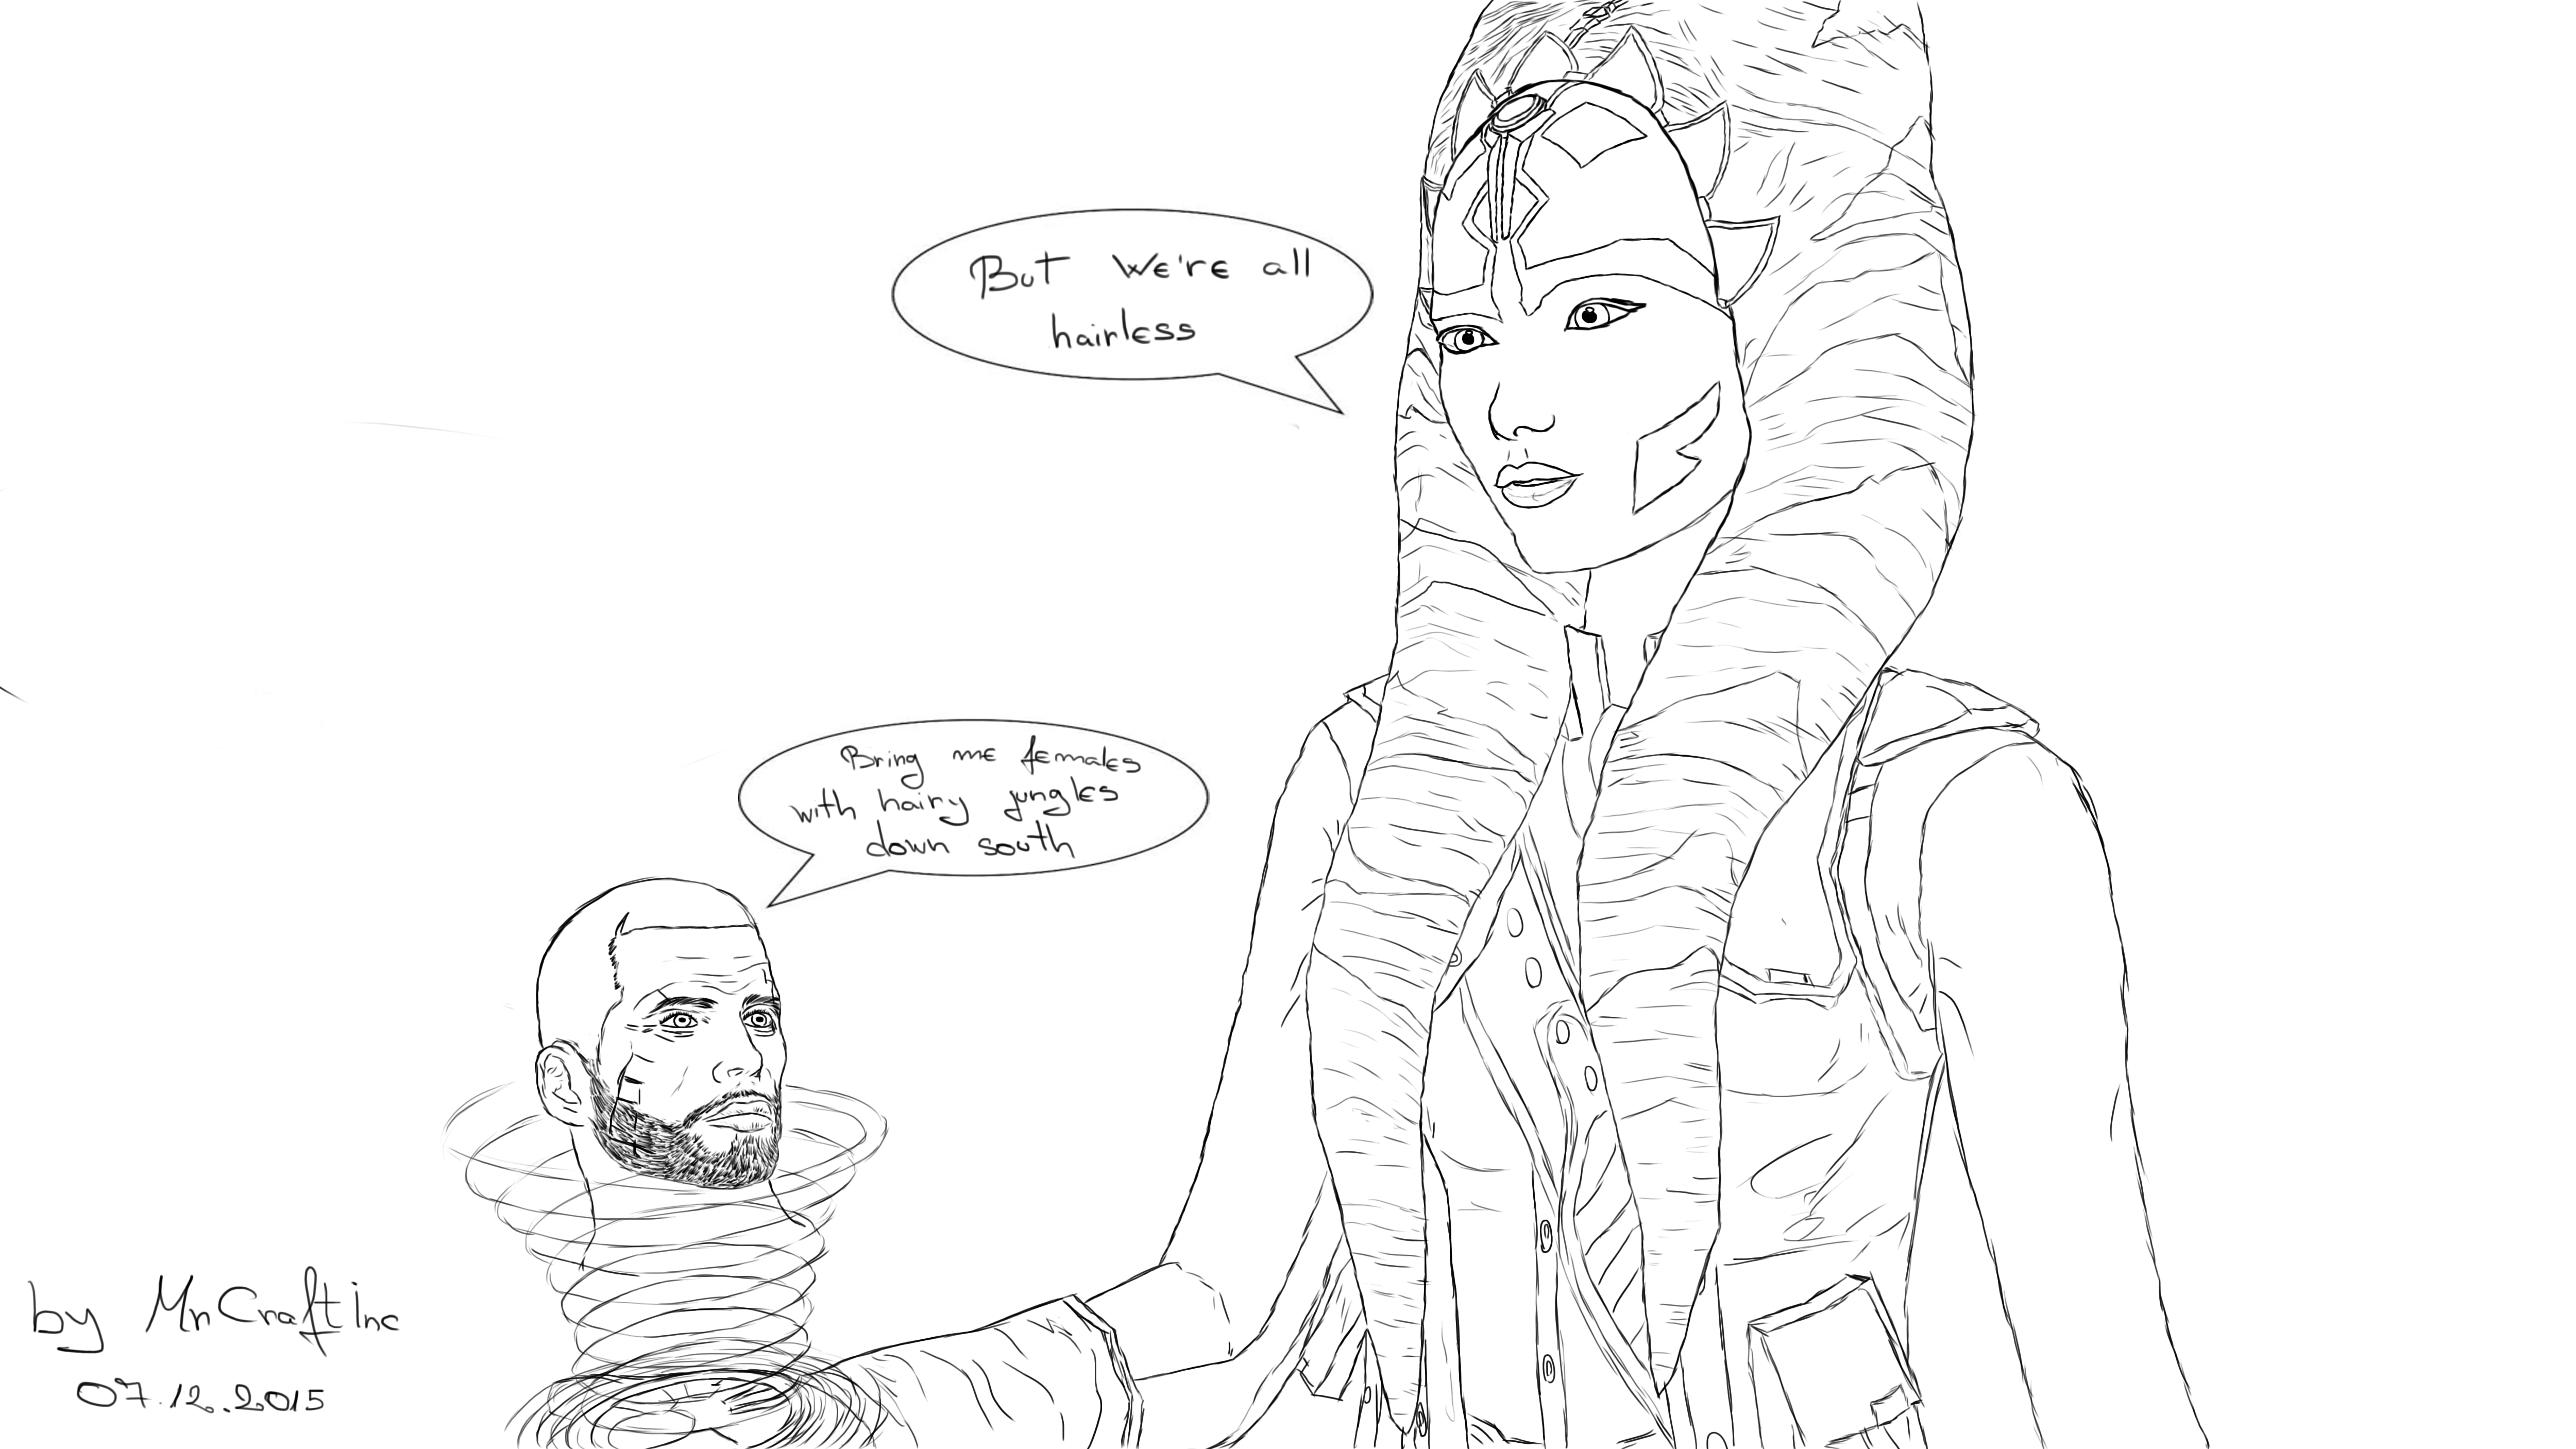 5000x2813 Star Wars Meets Shepard By Mrcraftinc